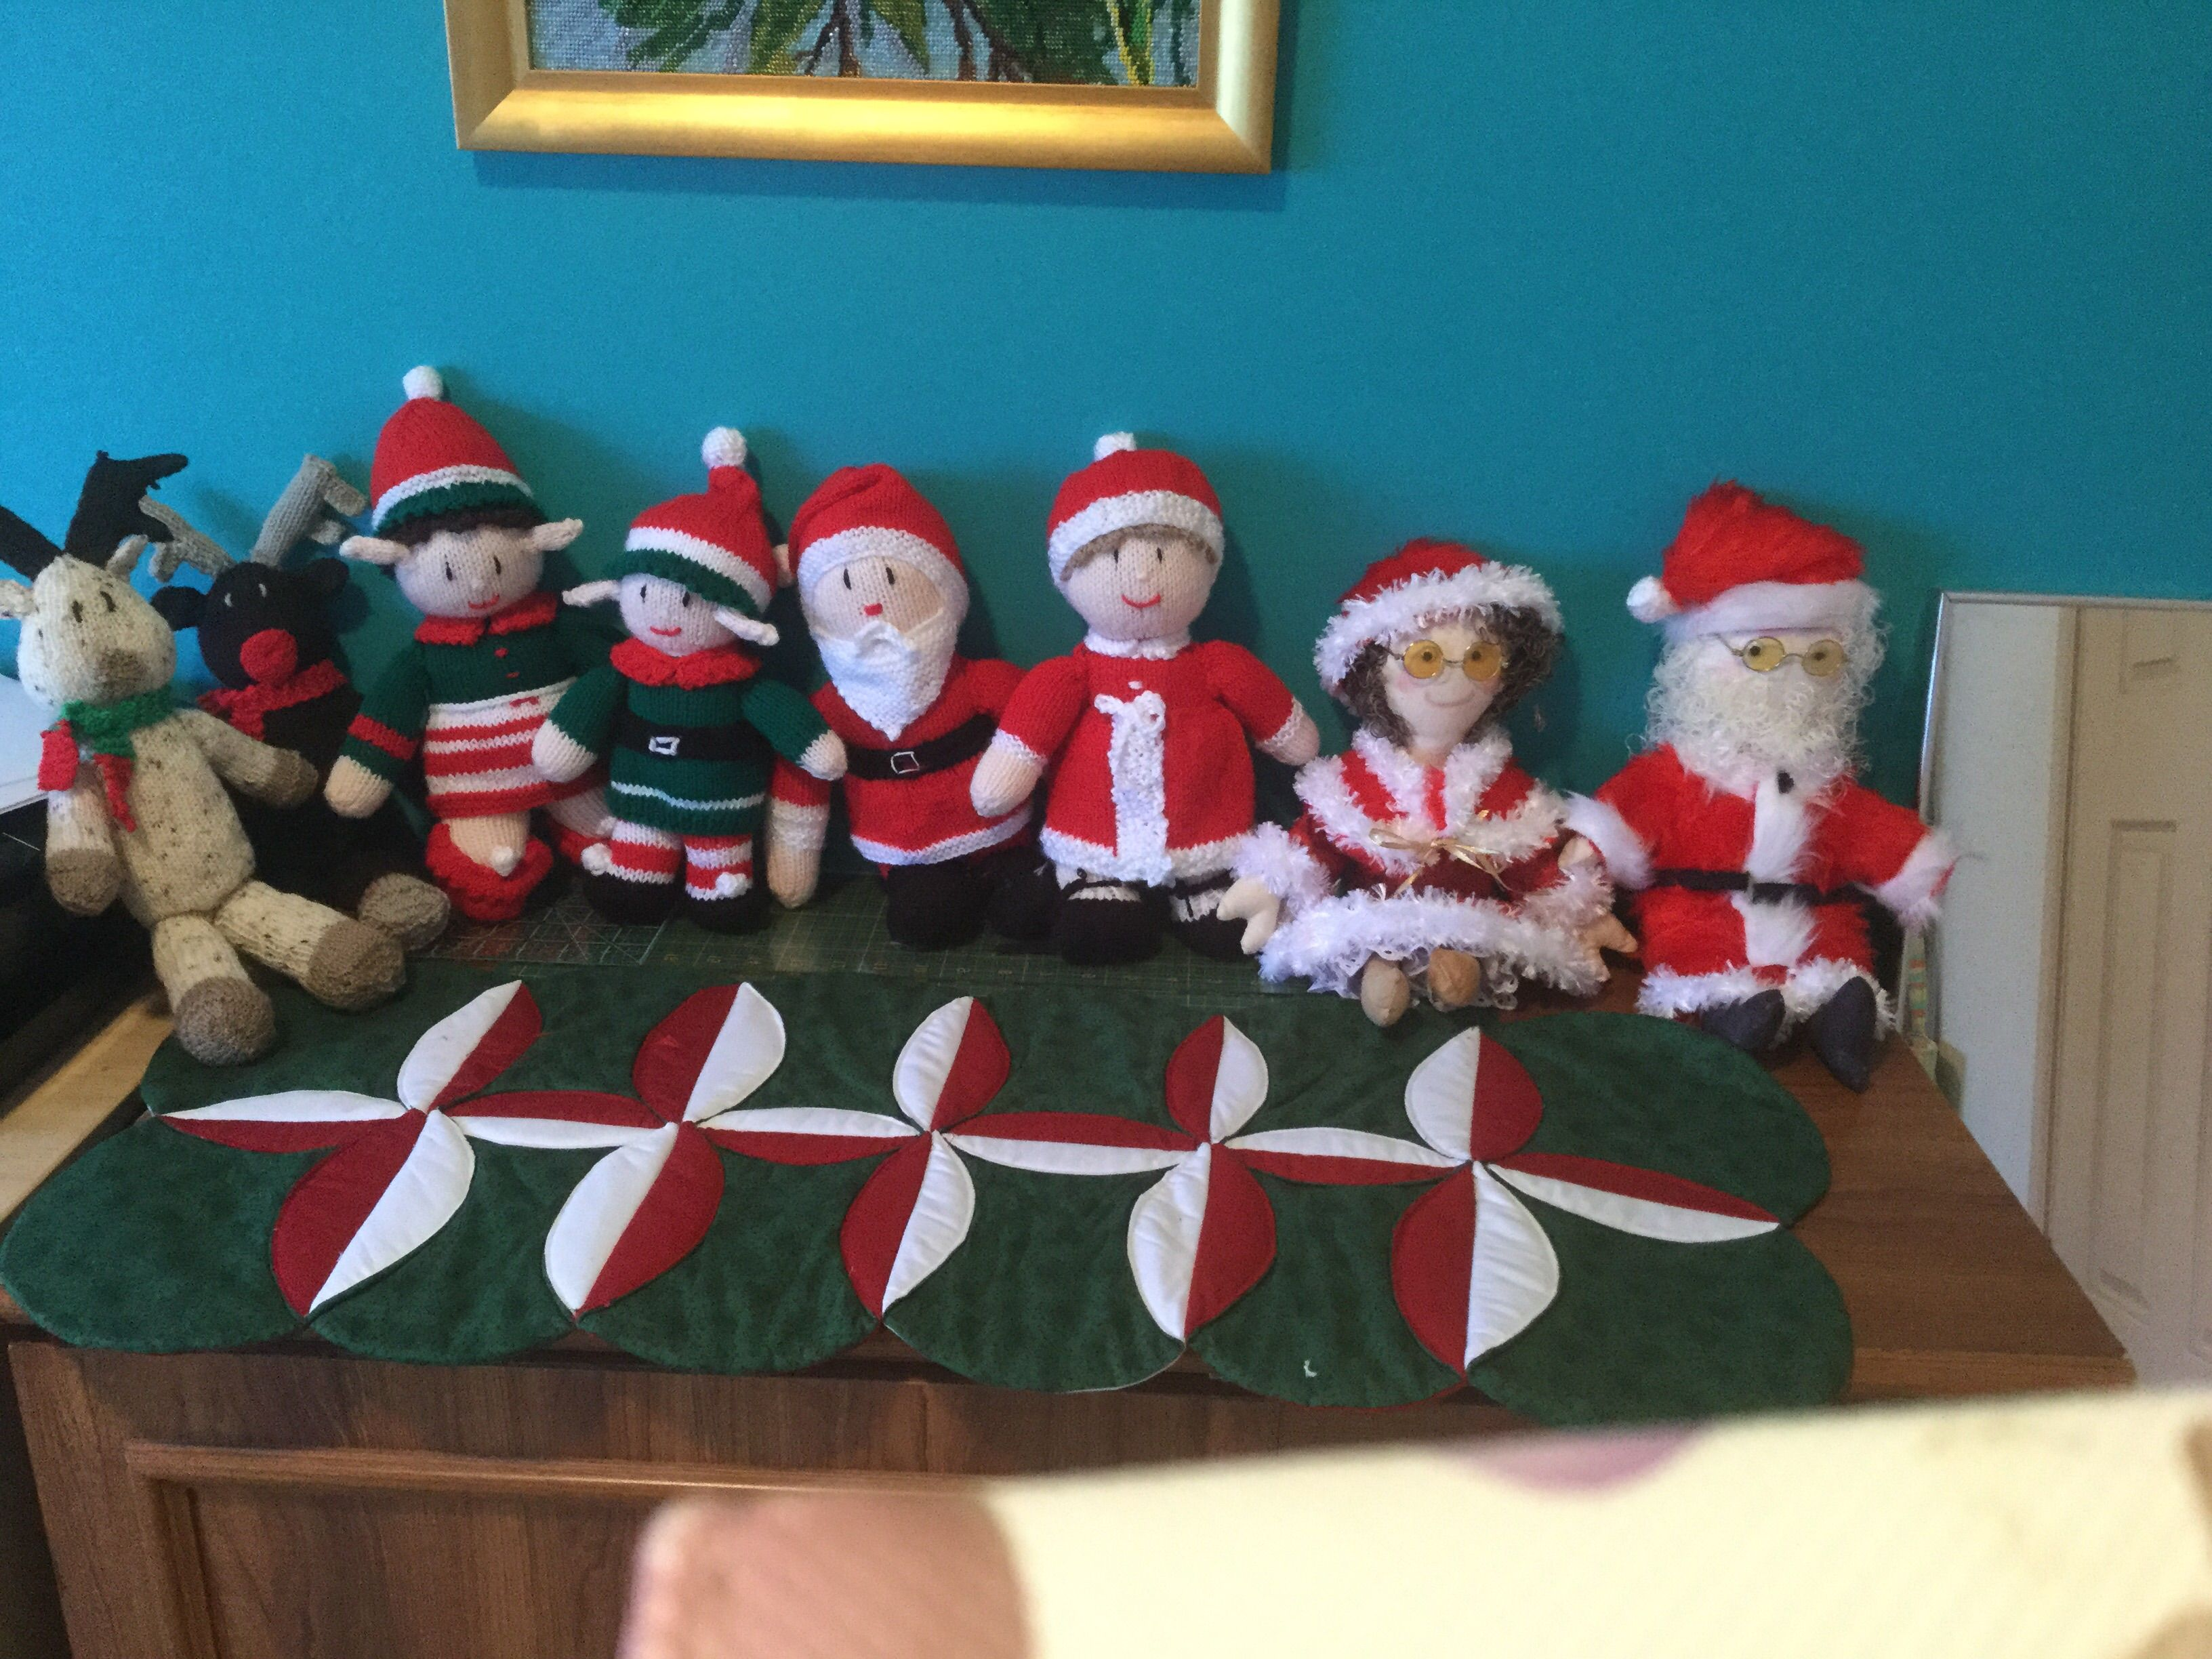 Hand knitted Santa dolls ,ready for Xmas